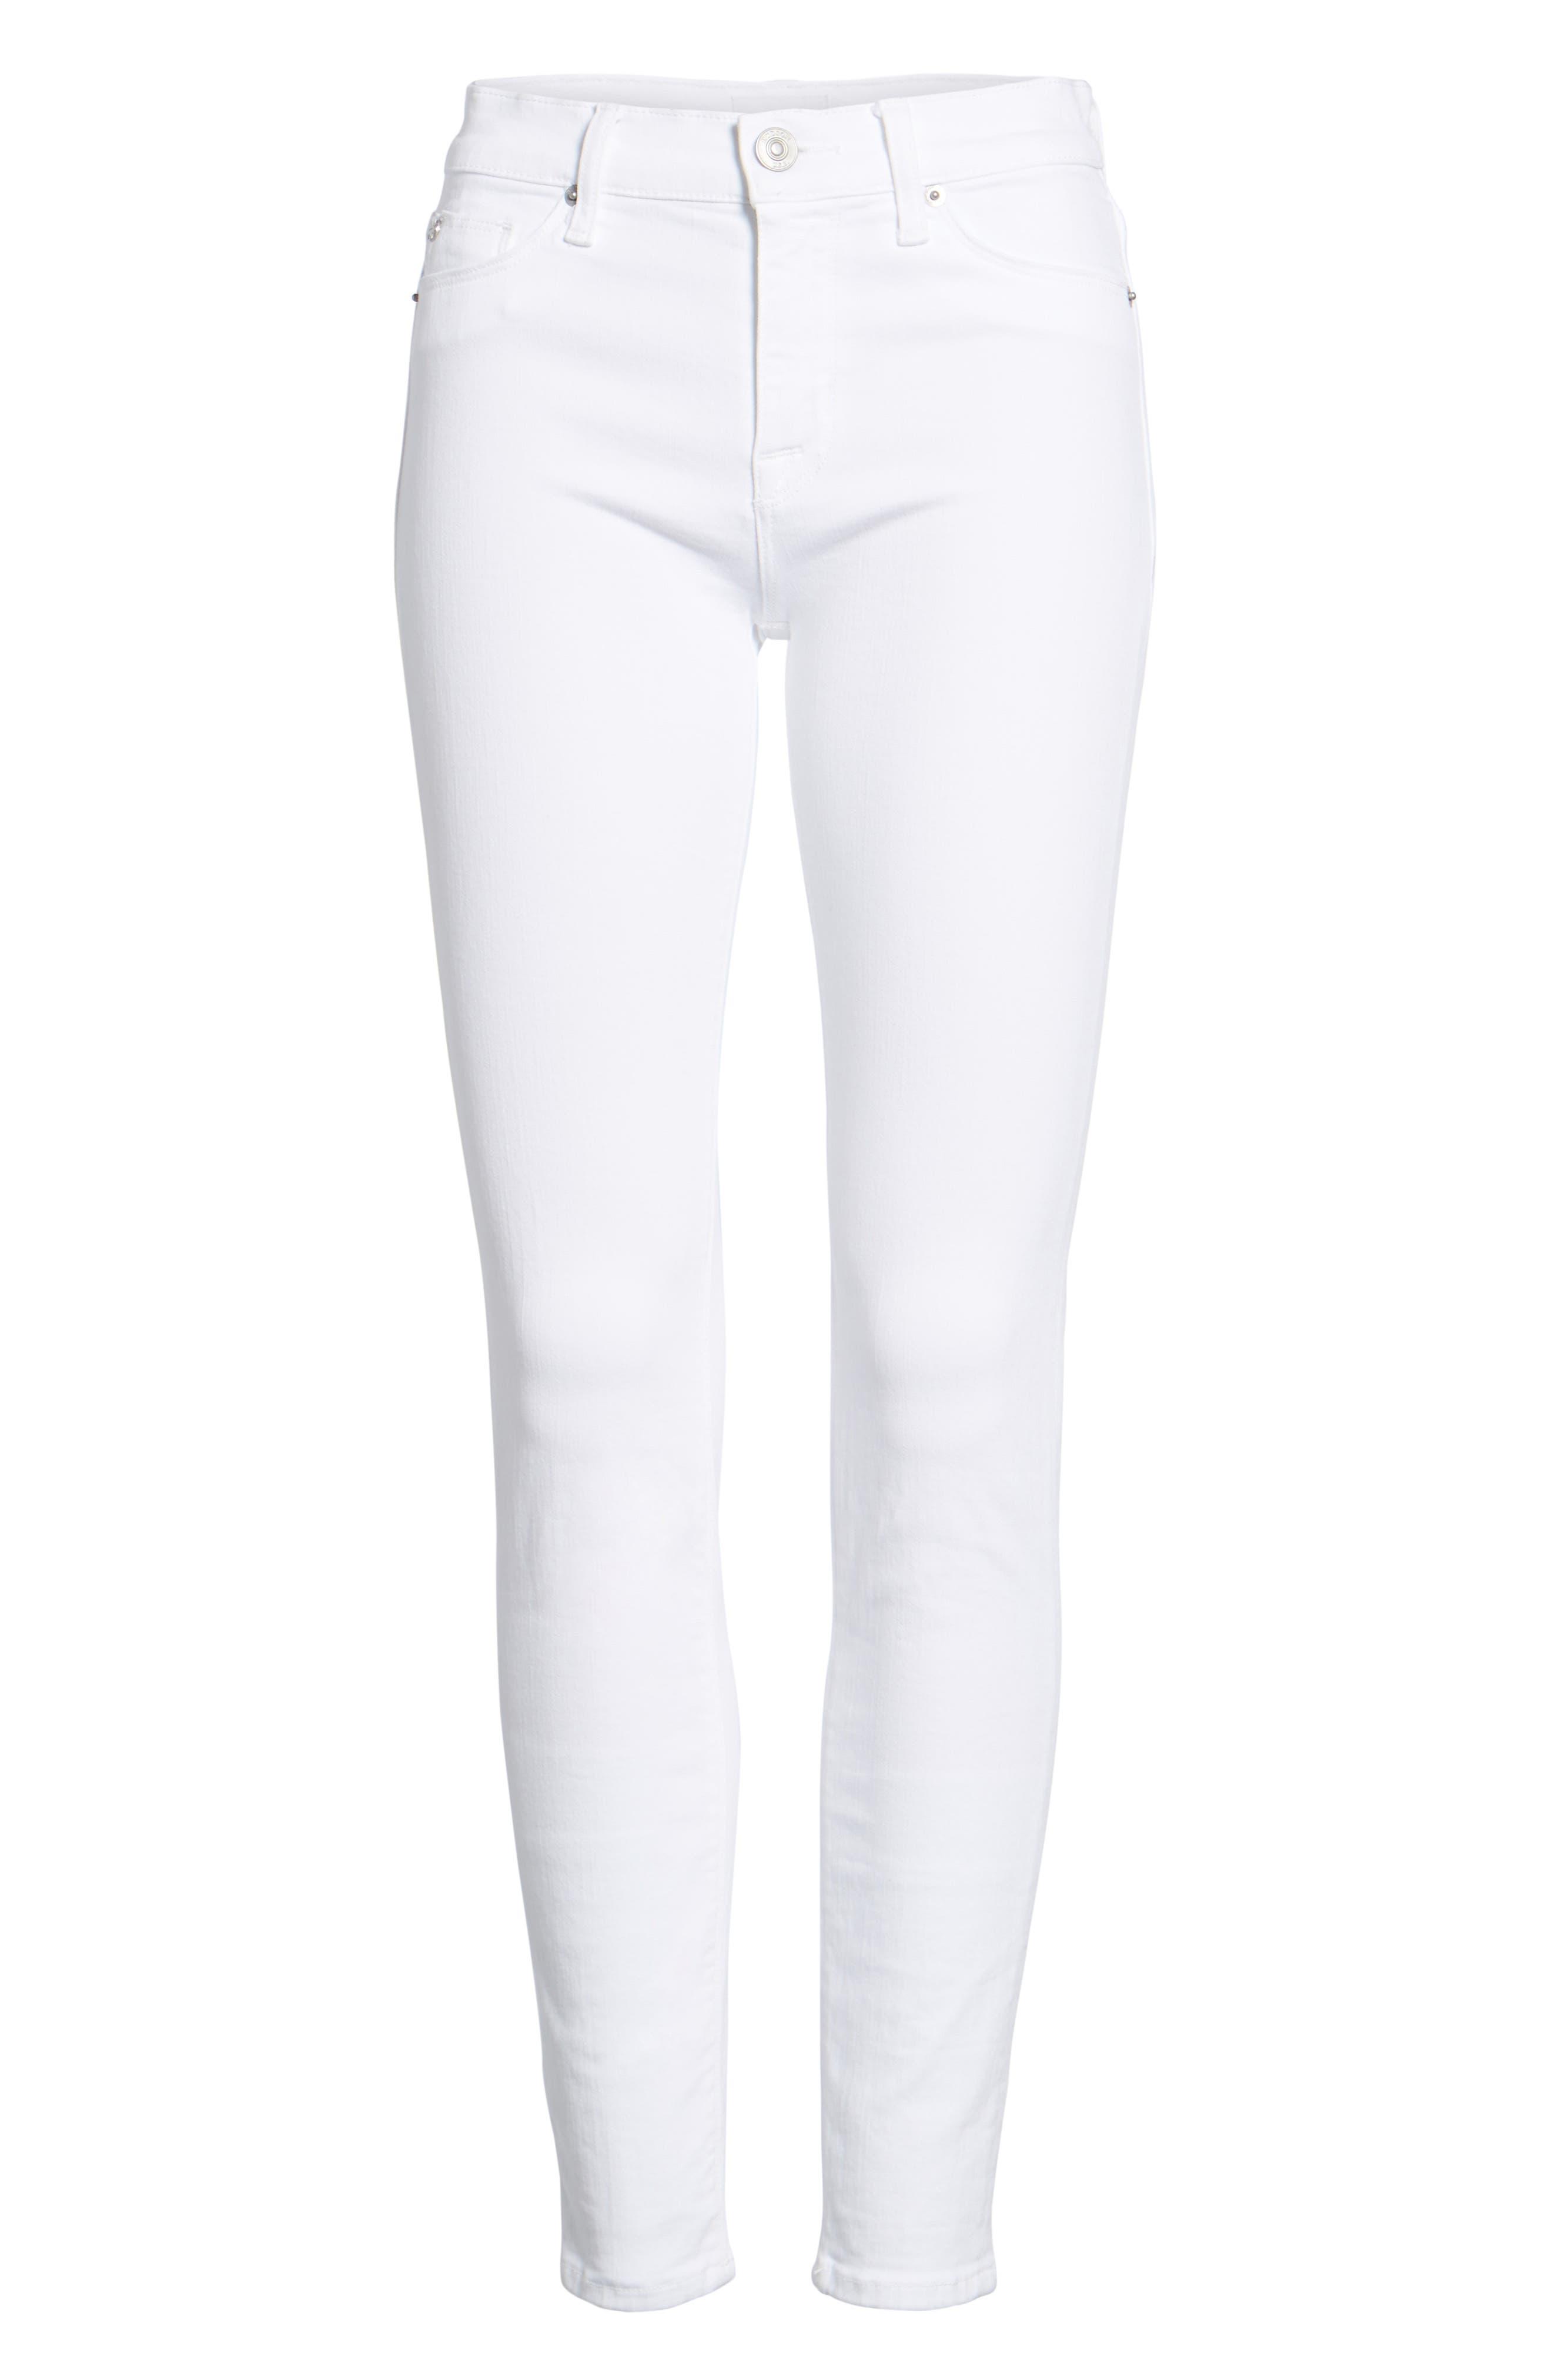 Nico Ankle Super Skinny Jeans,                             Alternate thumbnail 7, color,                             OPTICAL WHITE